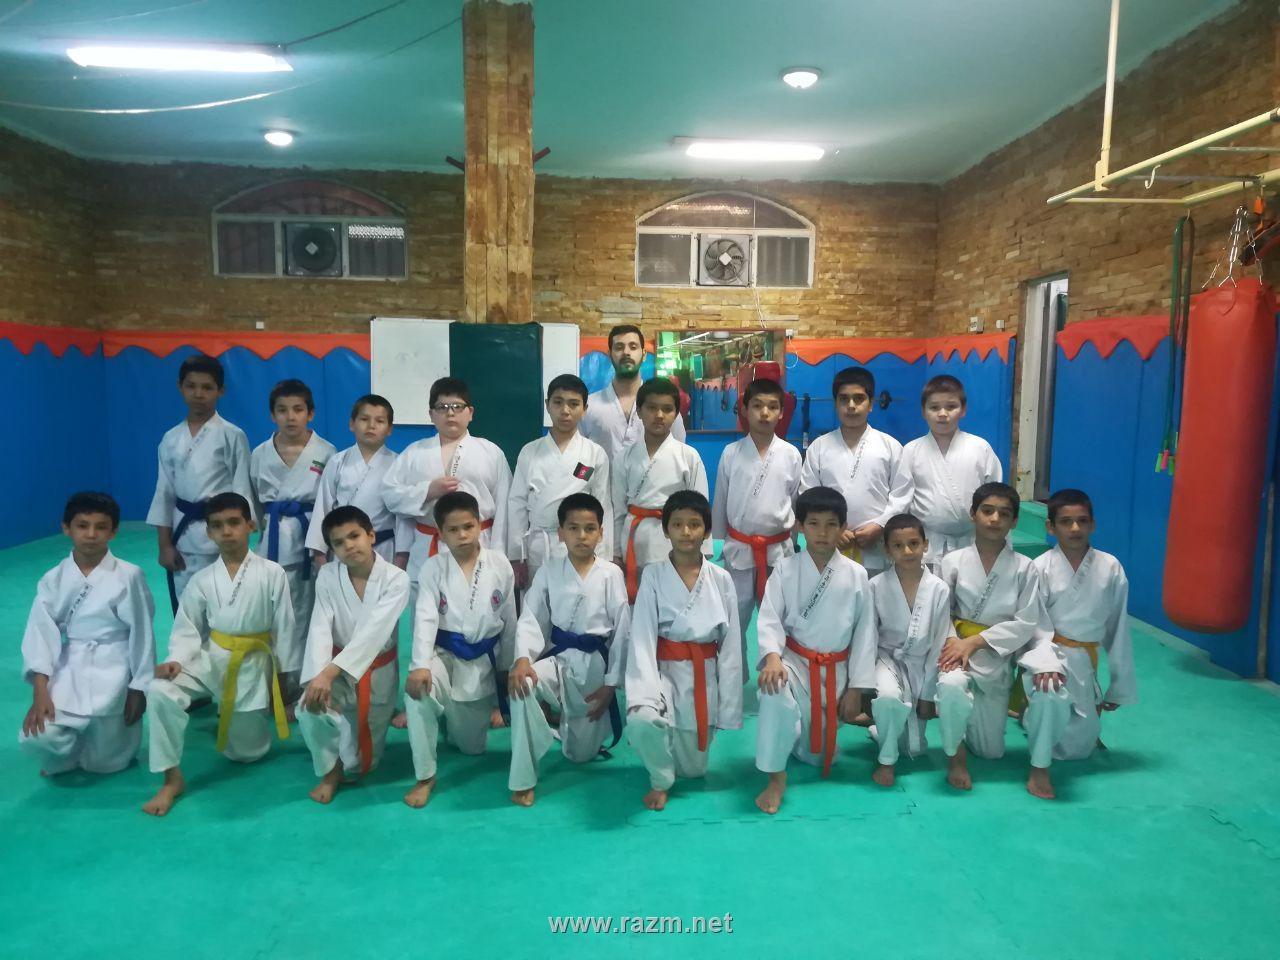 کلاس کاراته و رزمی نوجوانان